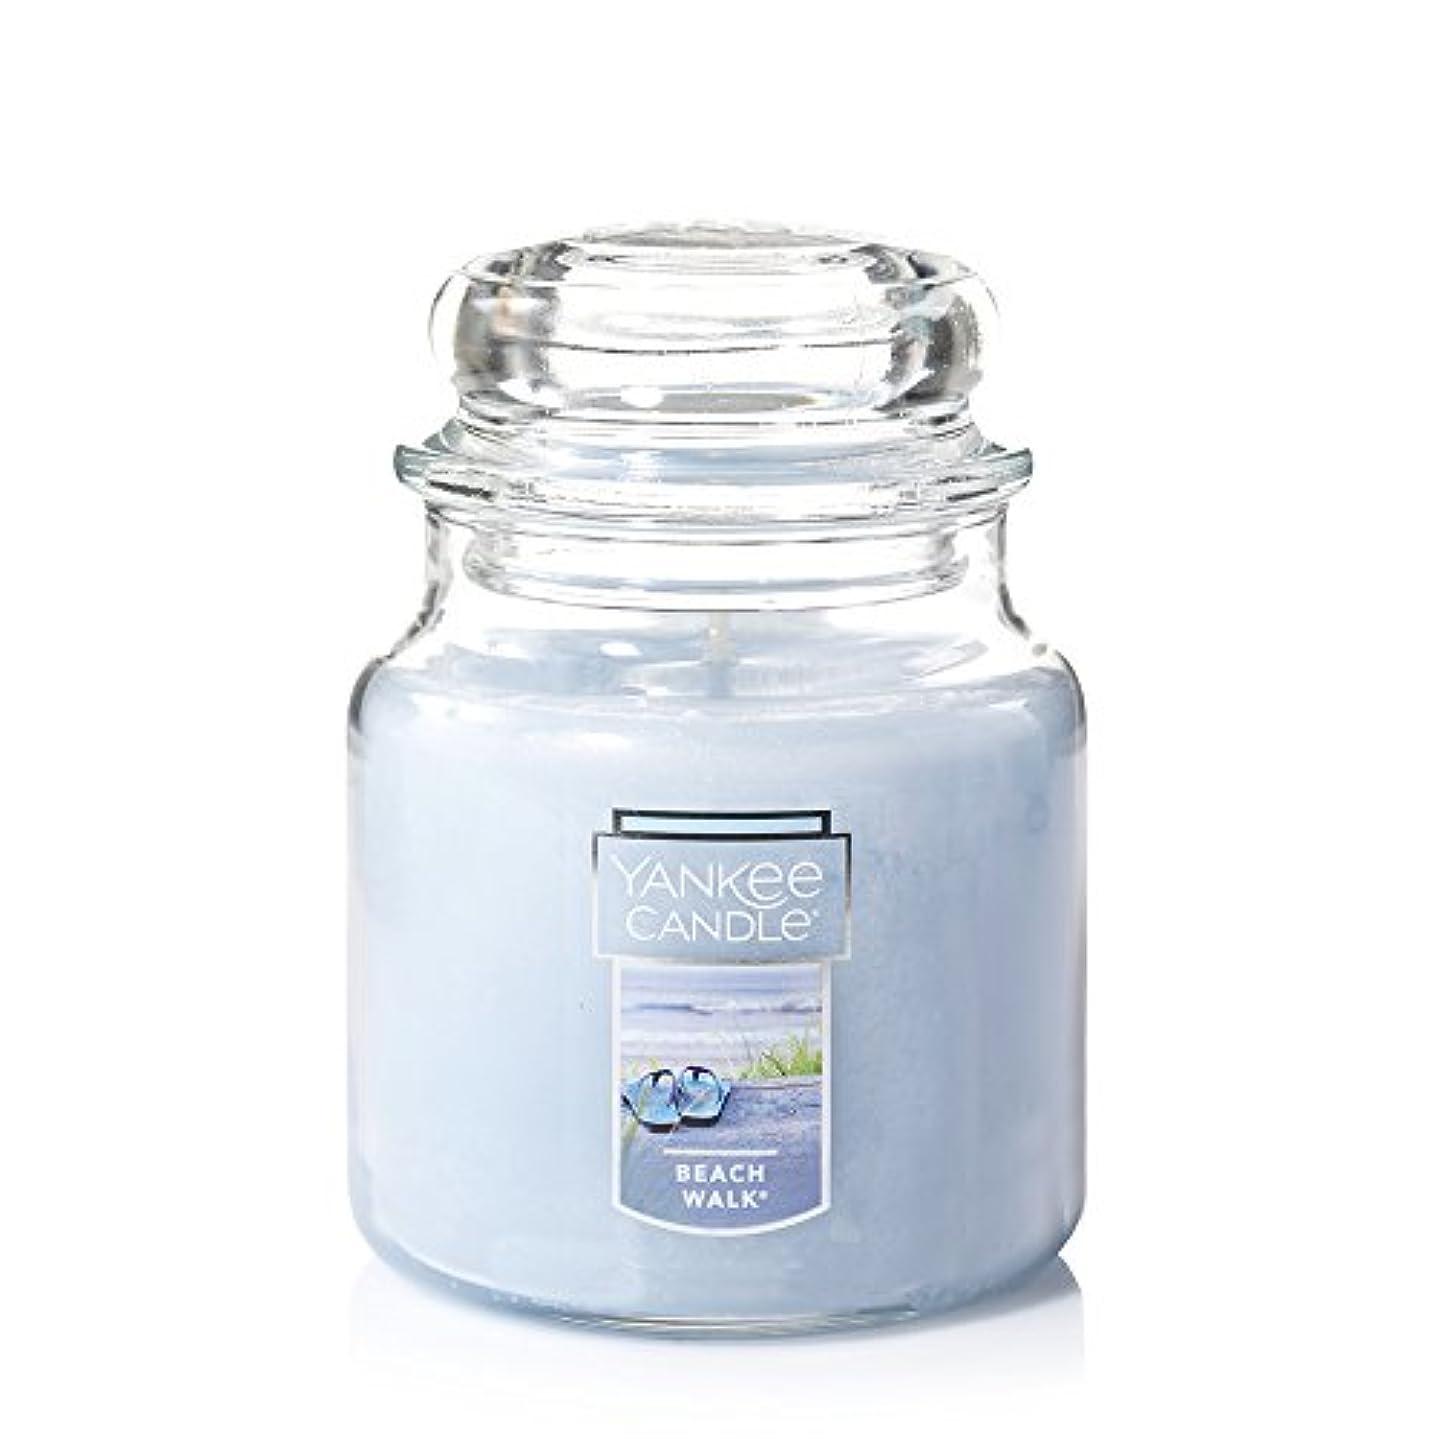 Yankee Candle Beach Walk Large Jar 22oz Candle Small Jar Candles ブルー 1129793